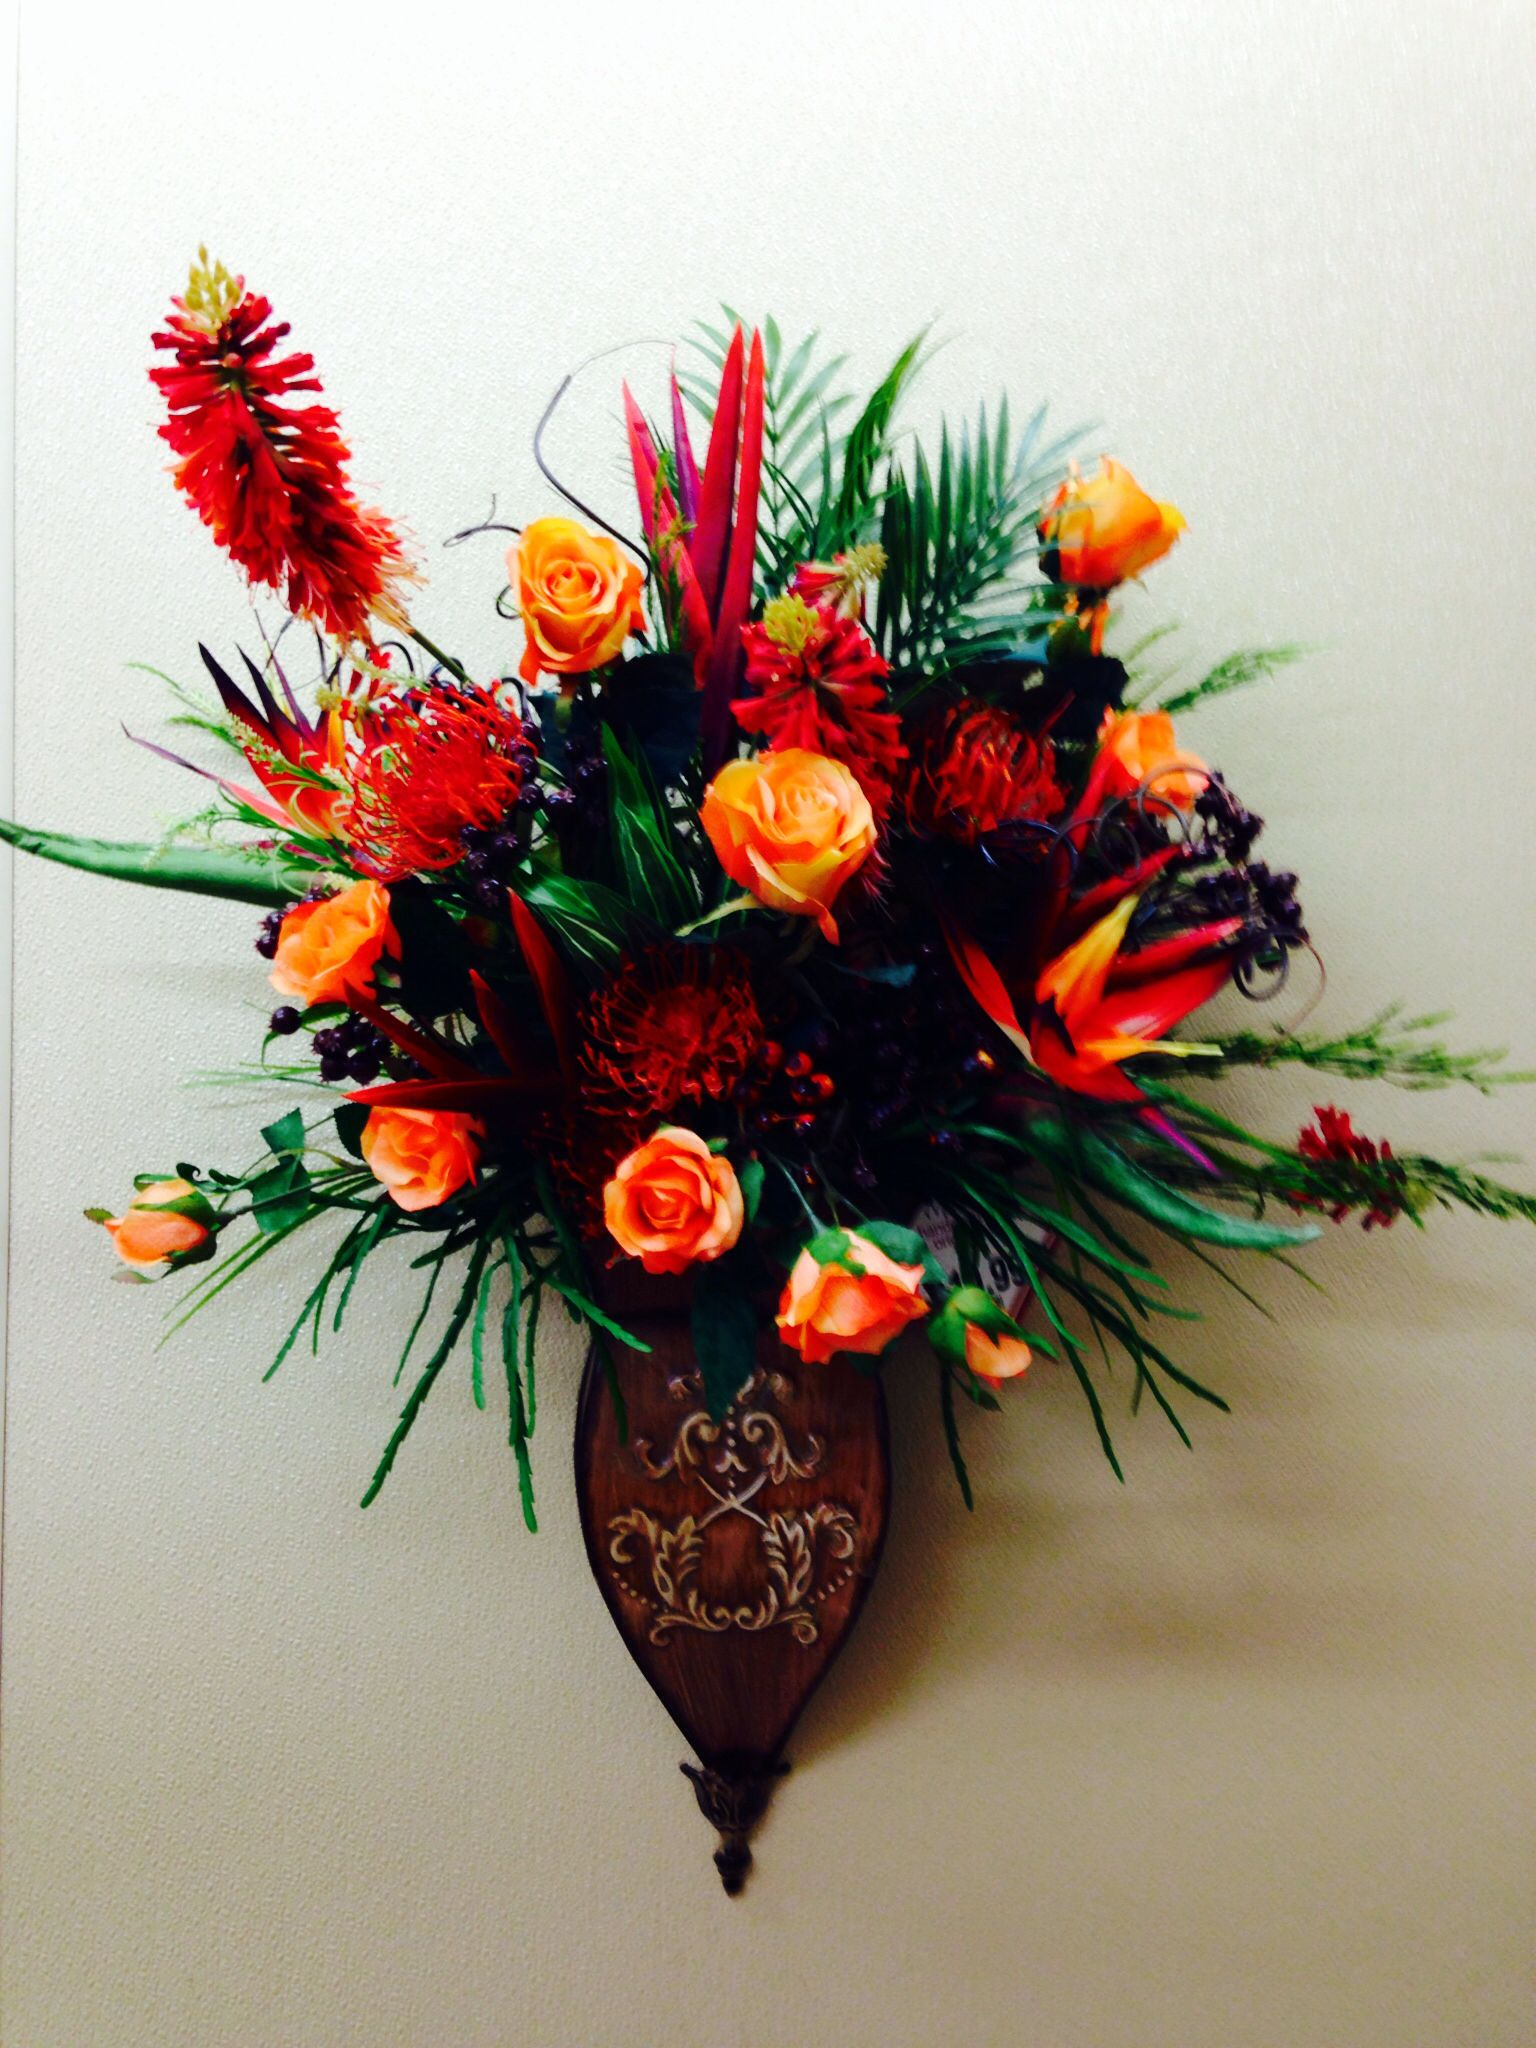 Tropical SBA wall sconce | Floral arrangements, Michael ... on Wall Sconce Floral Arrangements Arrangement id=63280